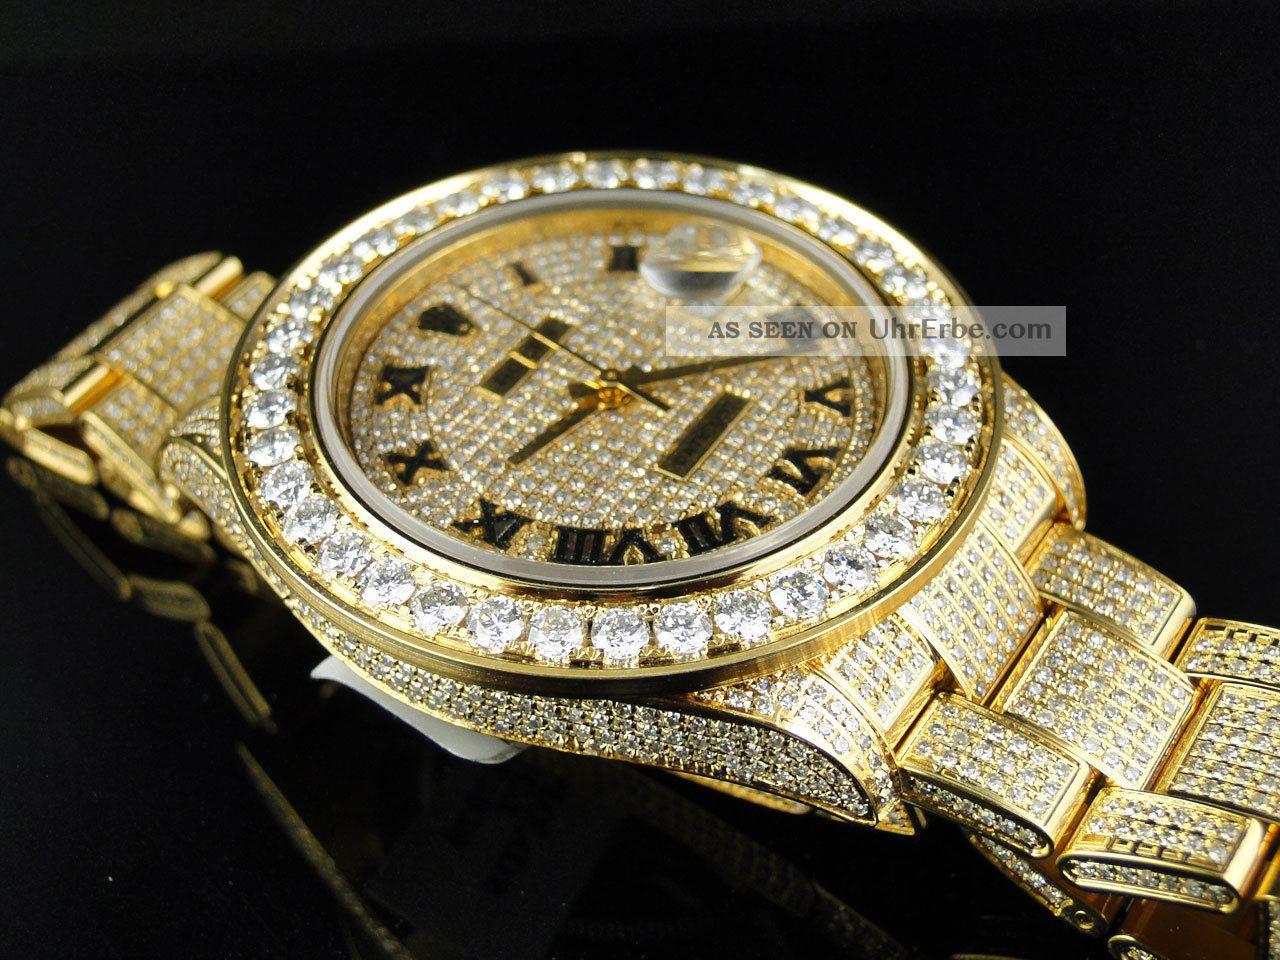 herren armbanduhr rolex date just ii 2 mit echten diamanten 45mm gelbgold. Black Bedroom Furniture Sets. Home Design Ideas